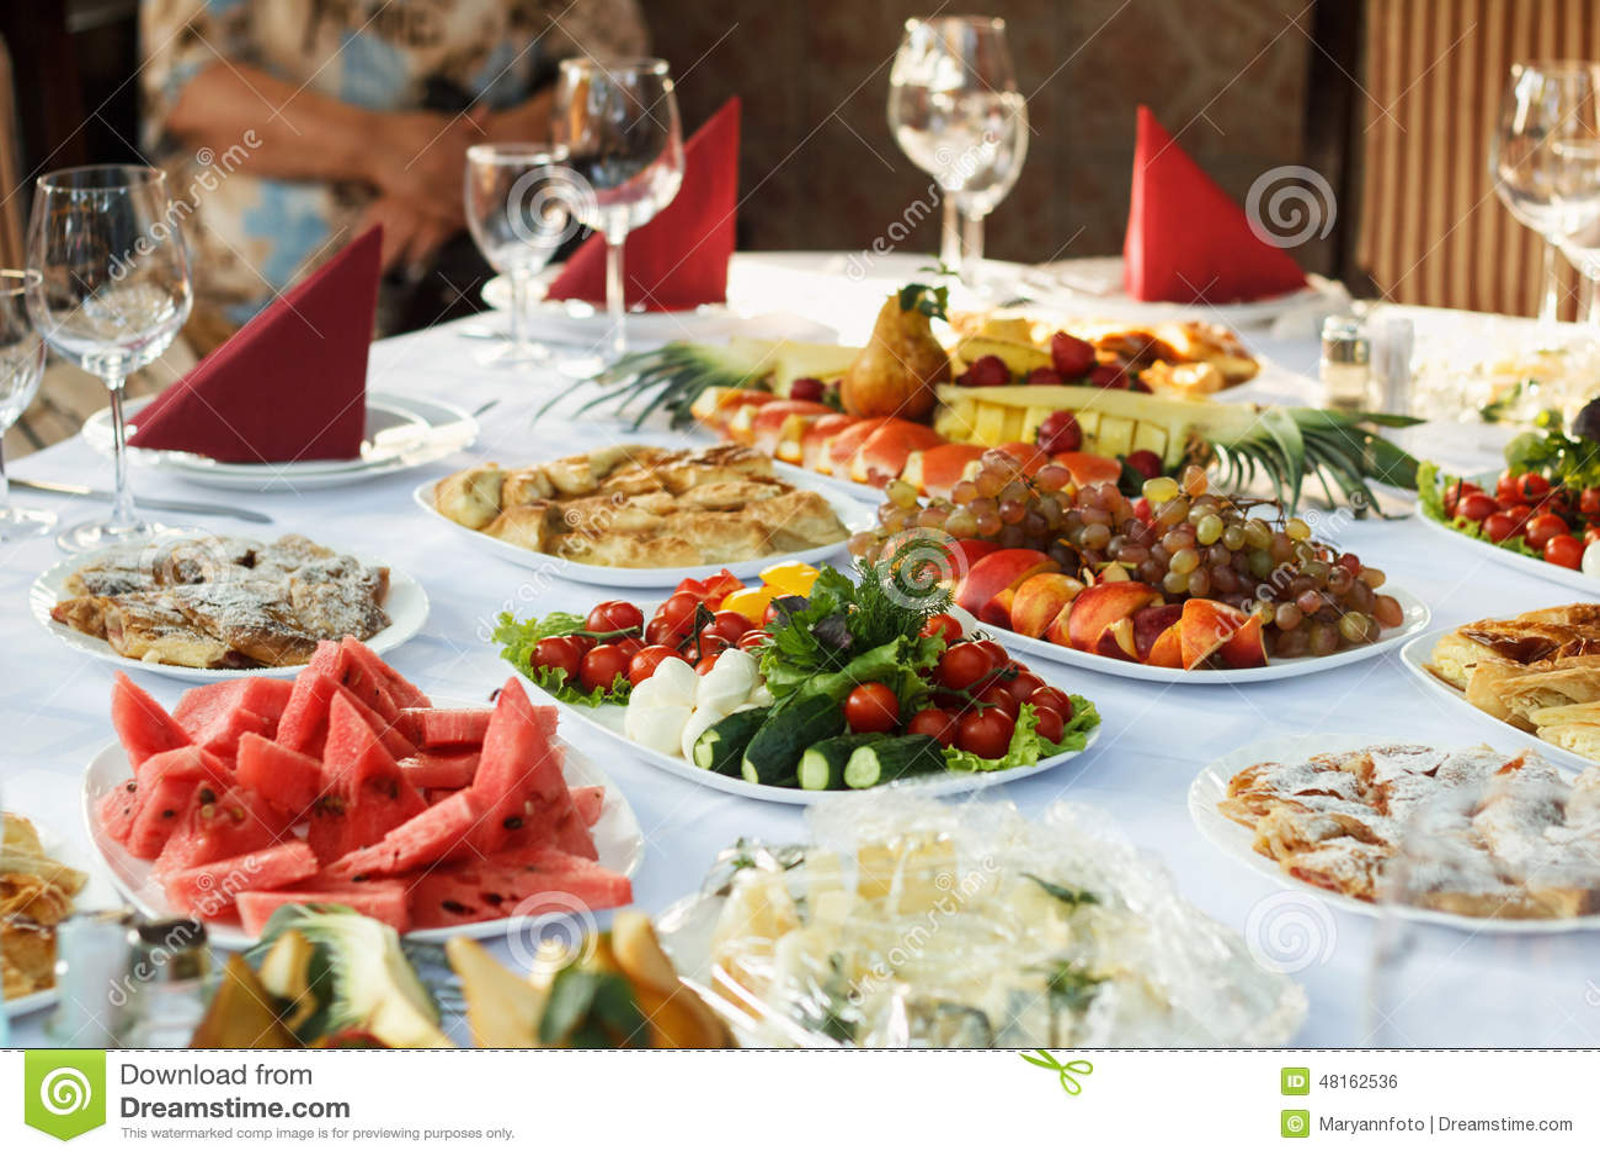 Wedding Banquet Food Prices